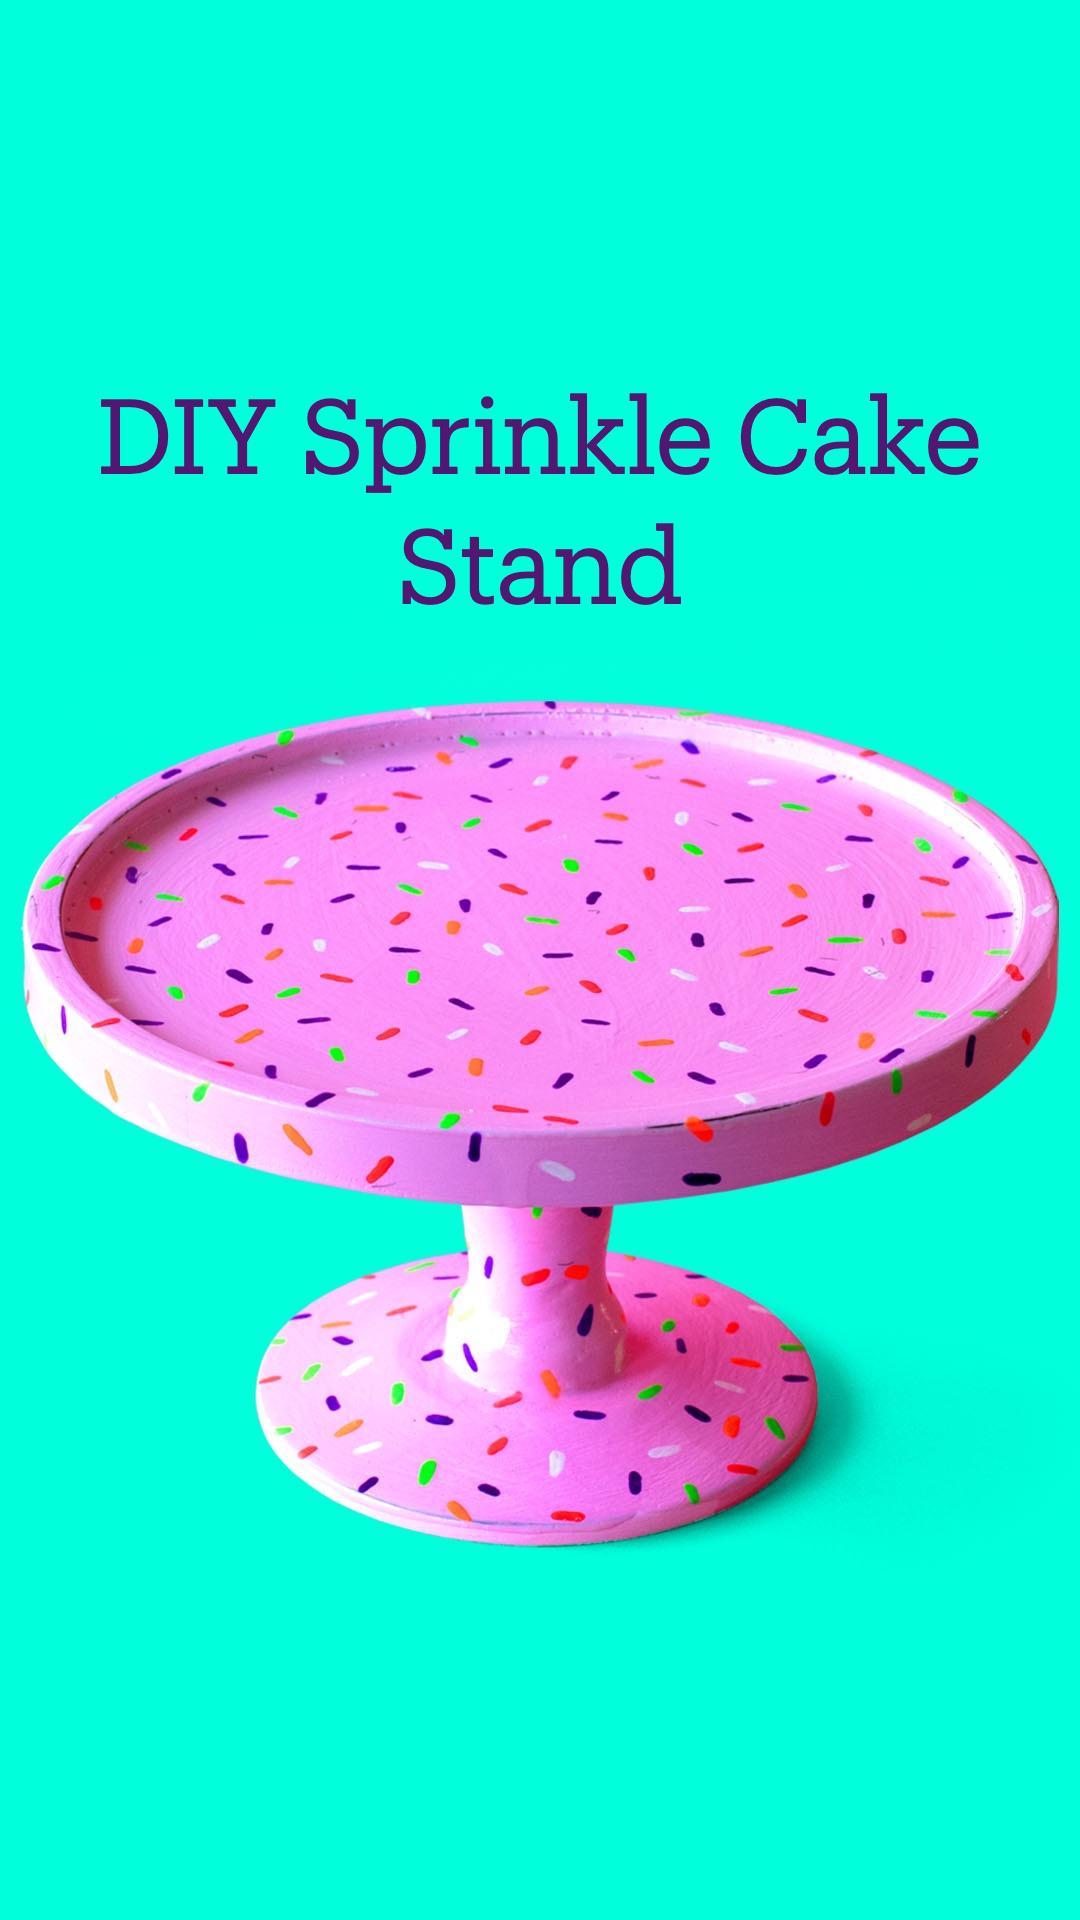 Free DIY Sprinkle Cake Stand